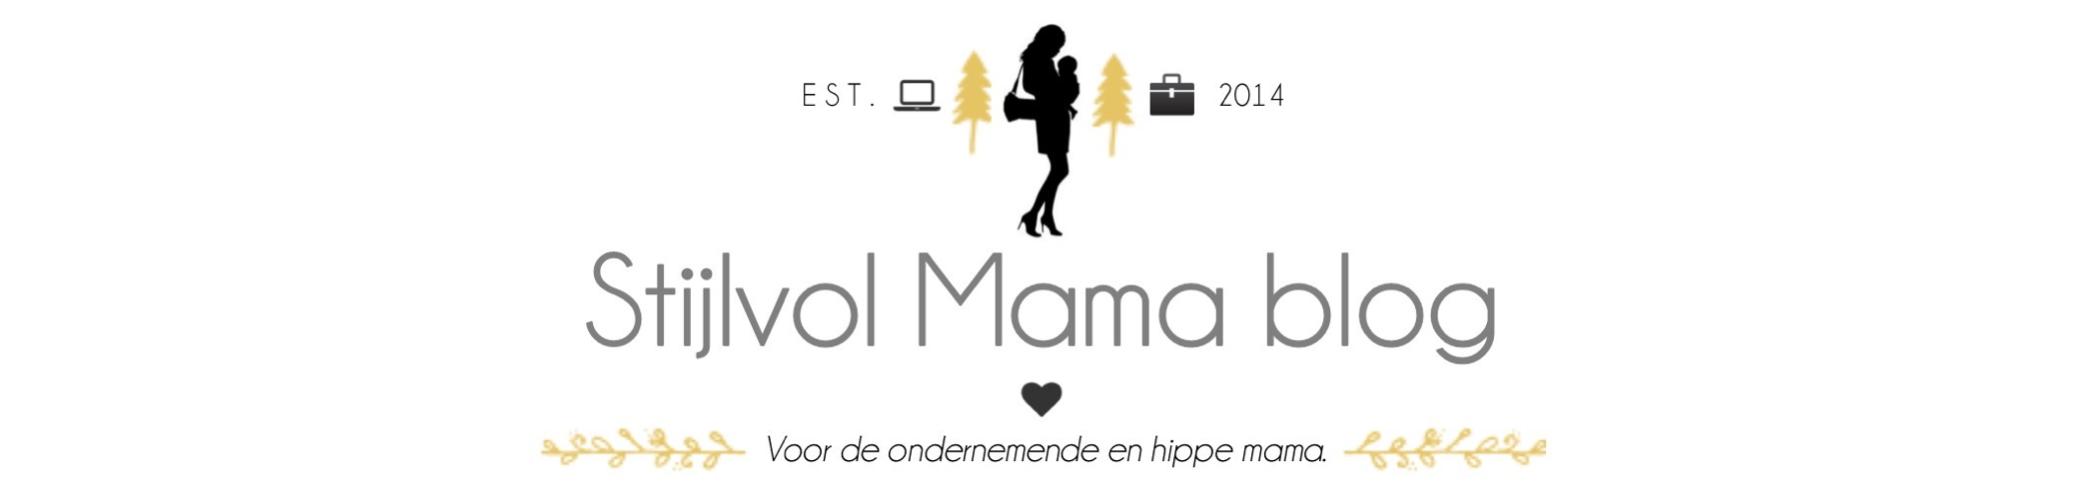 Stijlvol Mama & Lifestyle blog